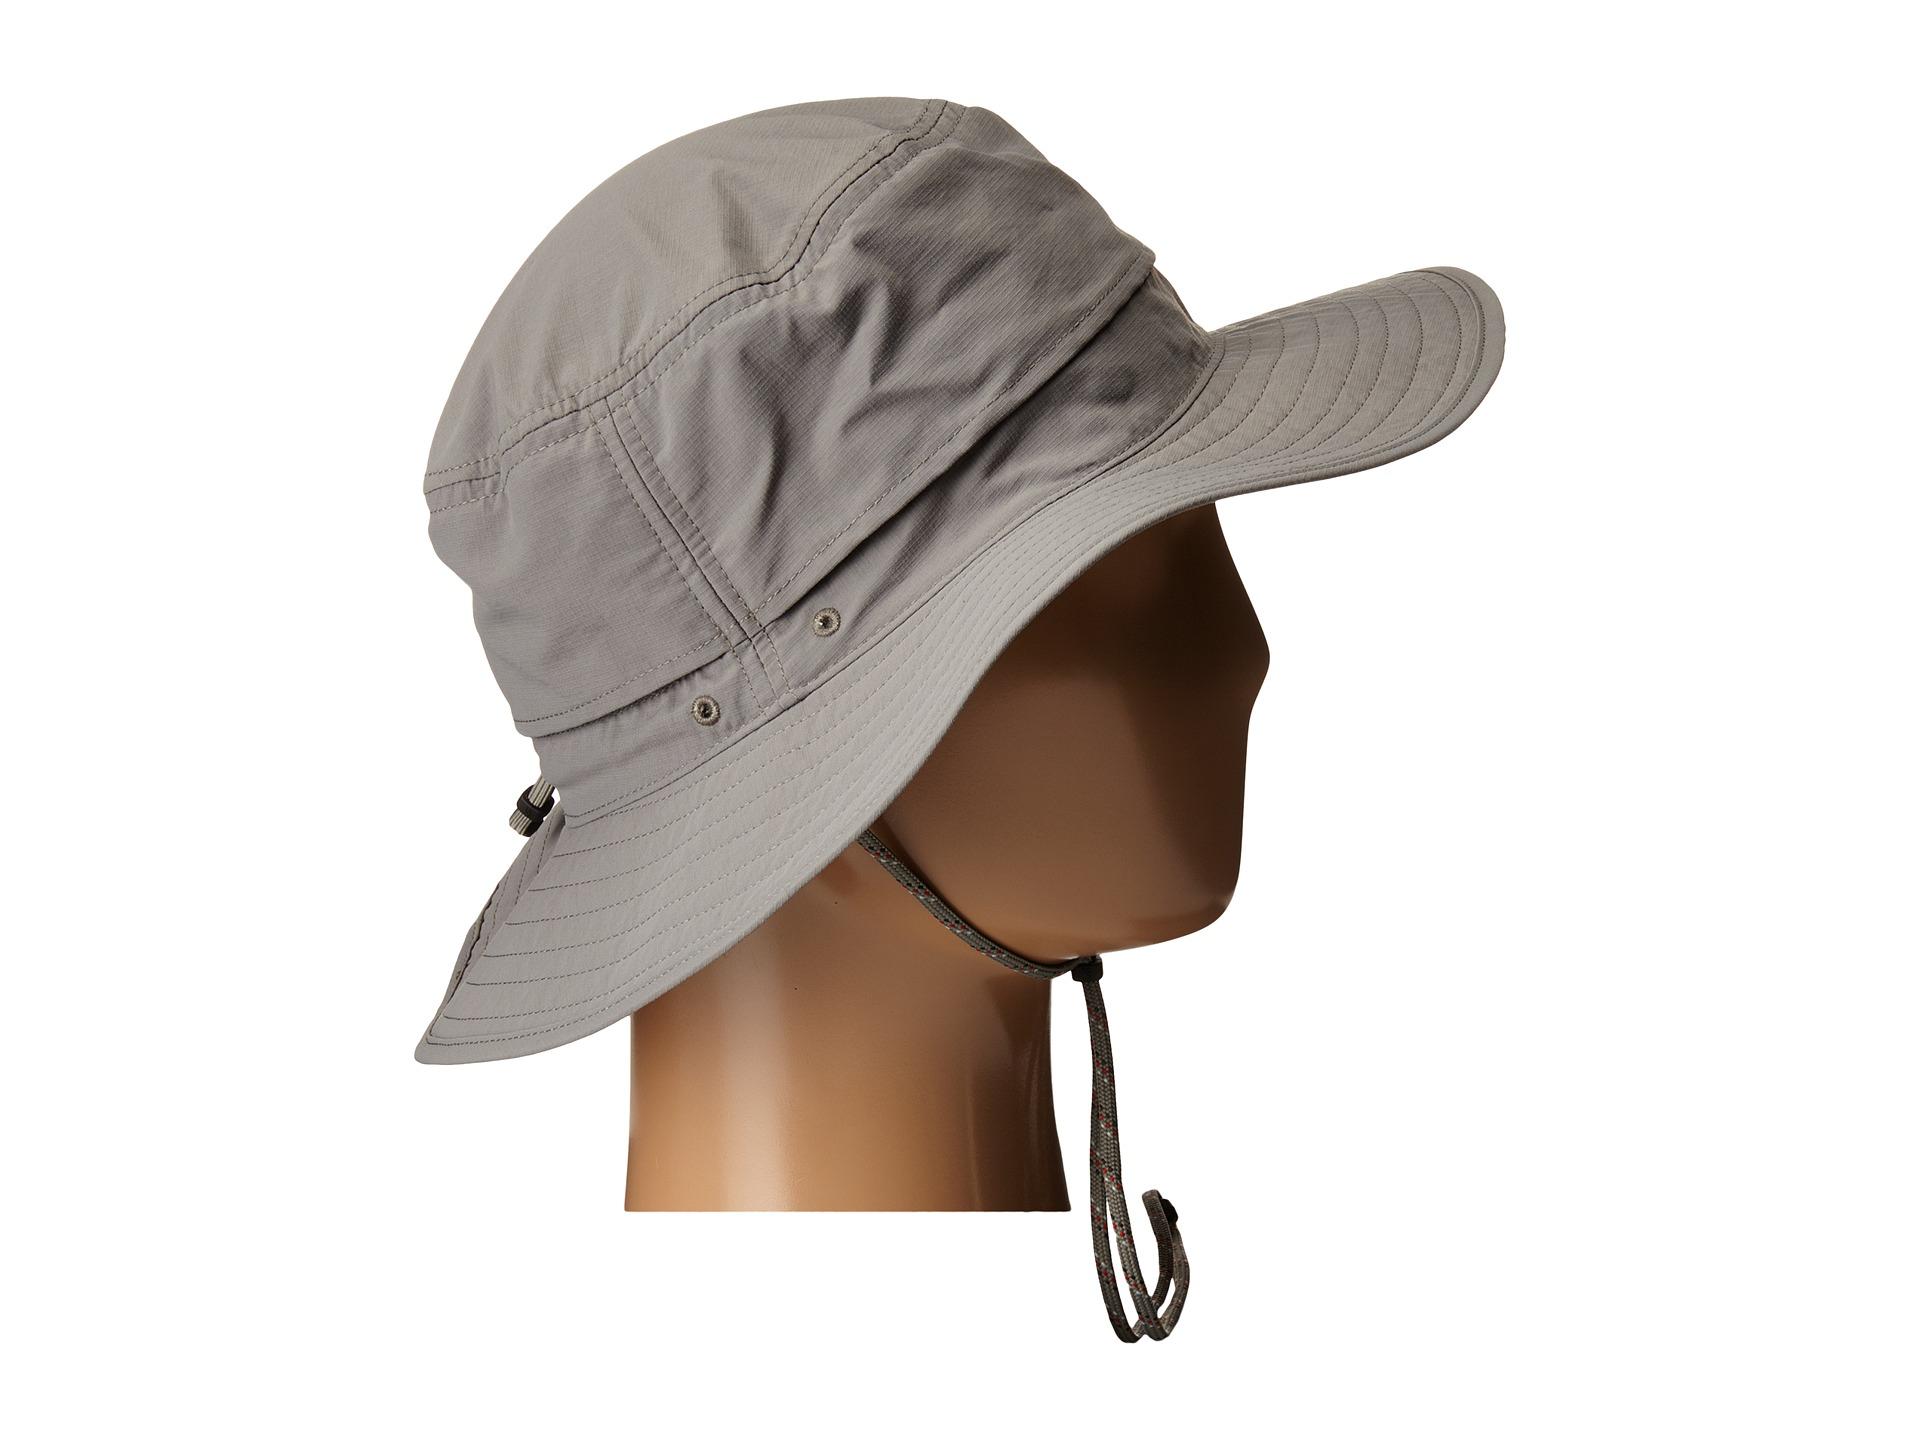 e20fb03ec899e The North Face Horizon Breeze Brimmer Hat in Gray for Men - Lyst